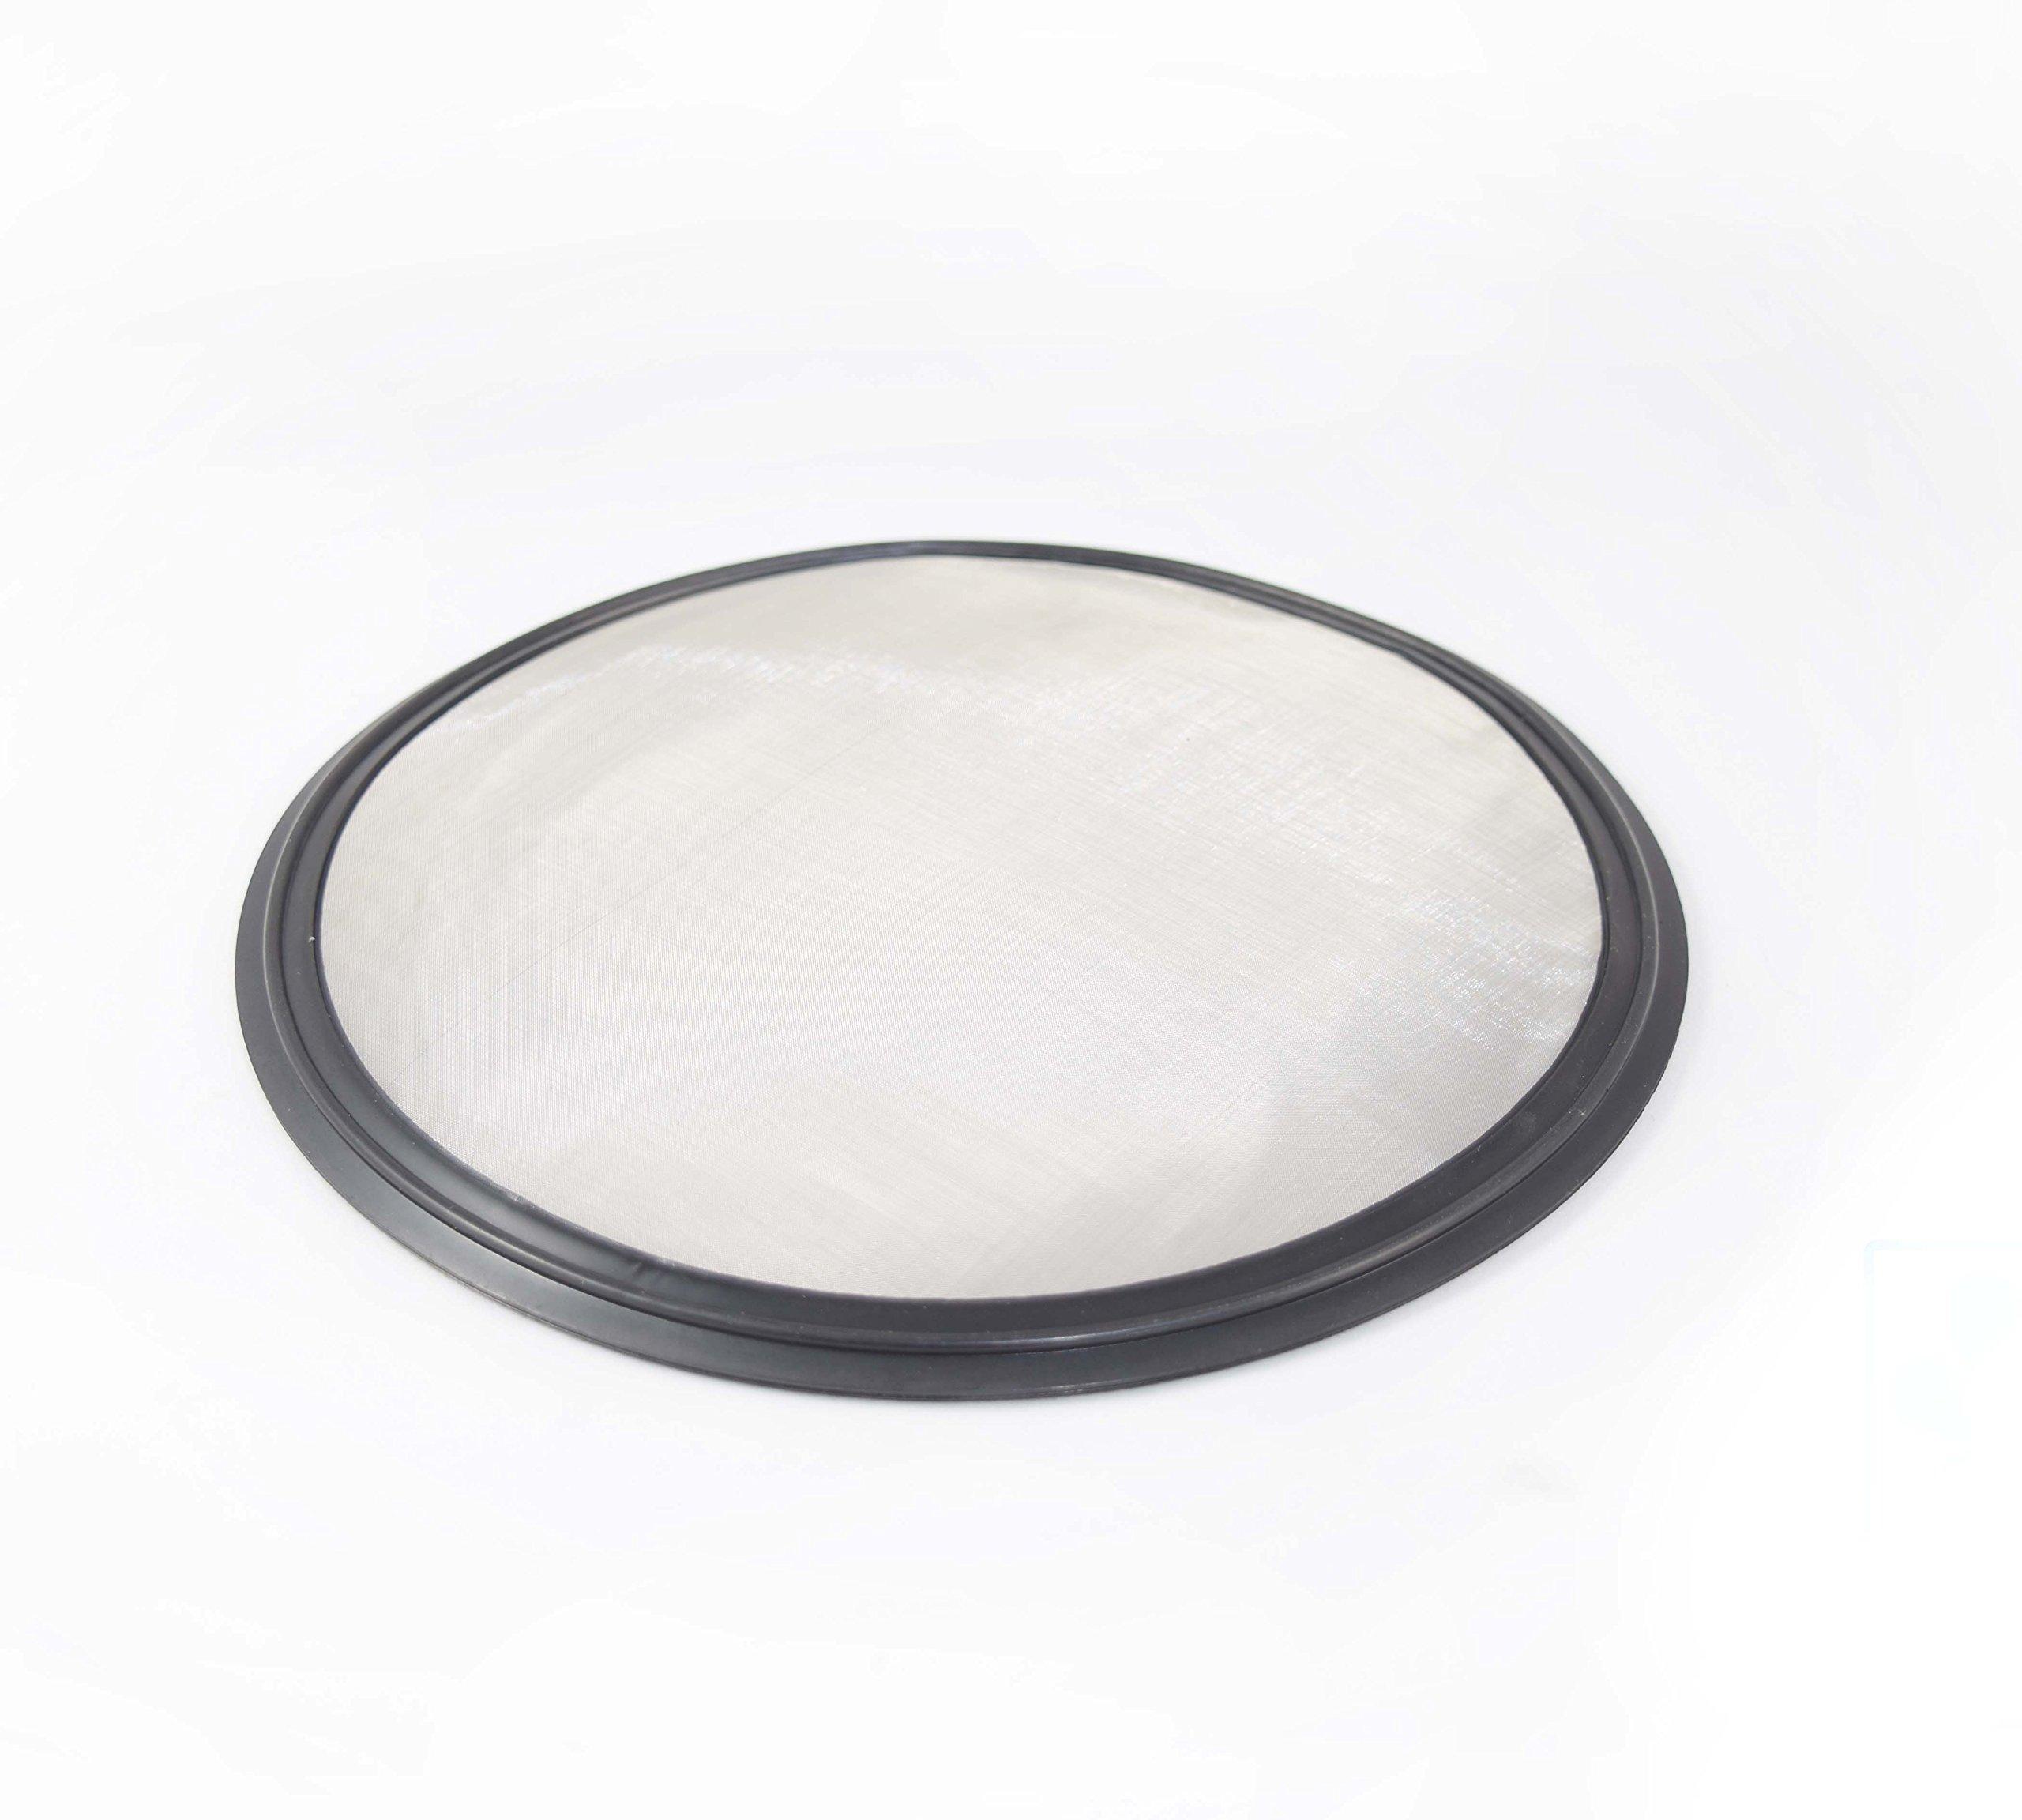 6'' Tri Clamp BUNA-N Screen Filter, Ferrule Gasket 316L 625 Mesh/20Uf Micron Screen Stainless Steel Pharmaceutical Grade Filter Mesh. BUNA-N With Mesh Material! & FDA Certification (6'')